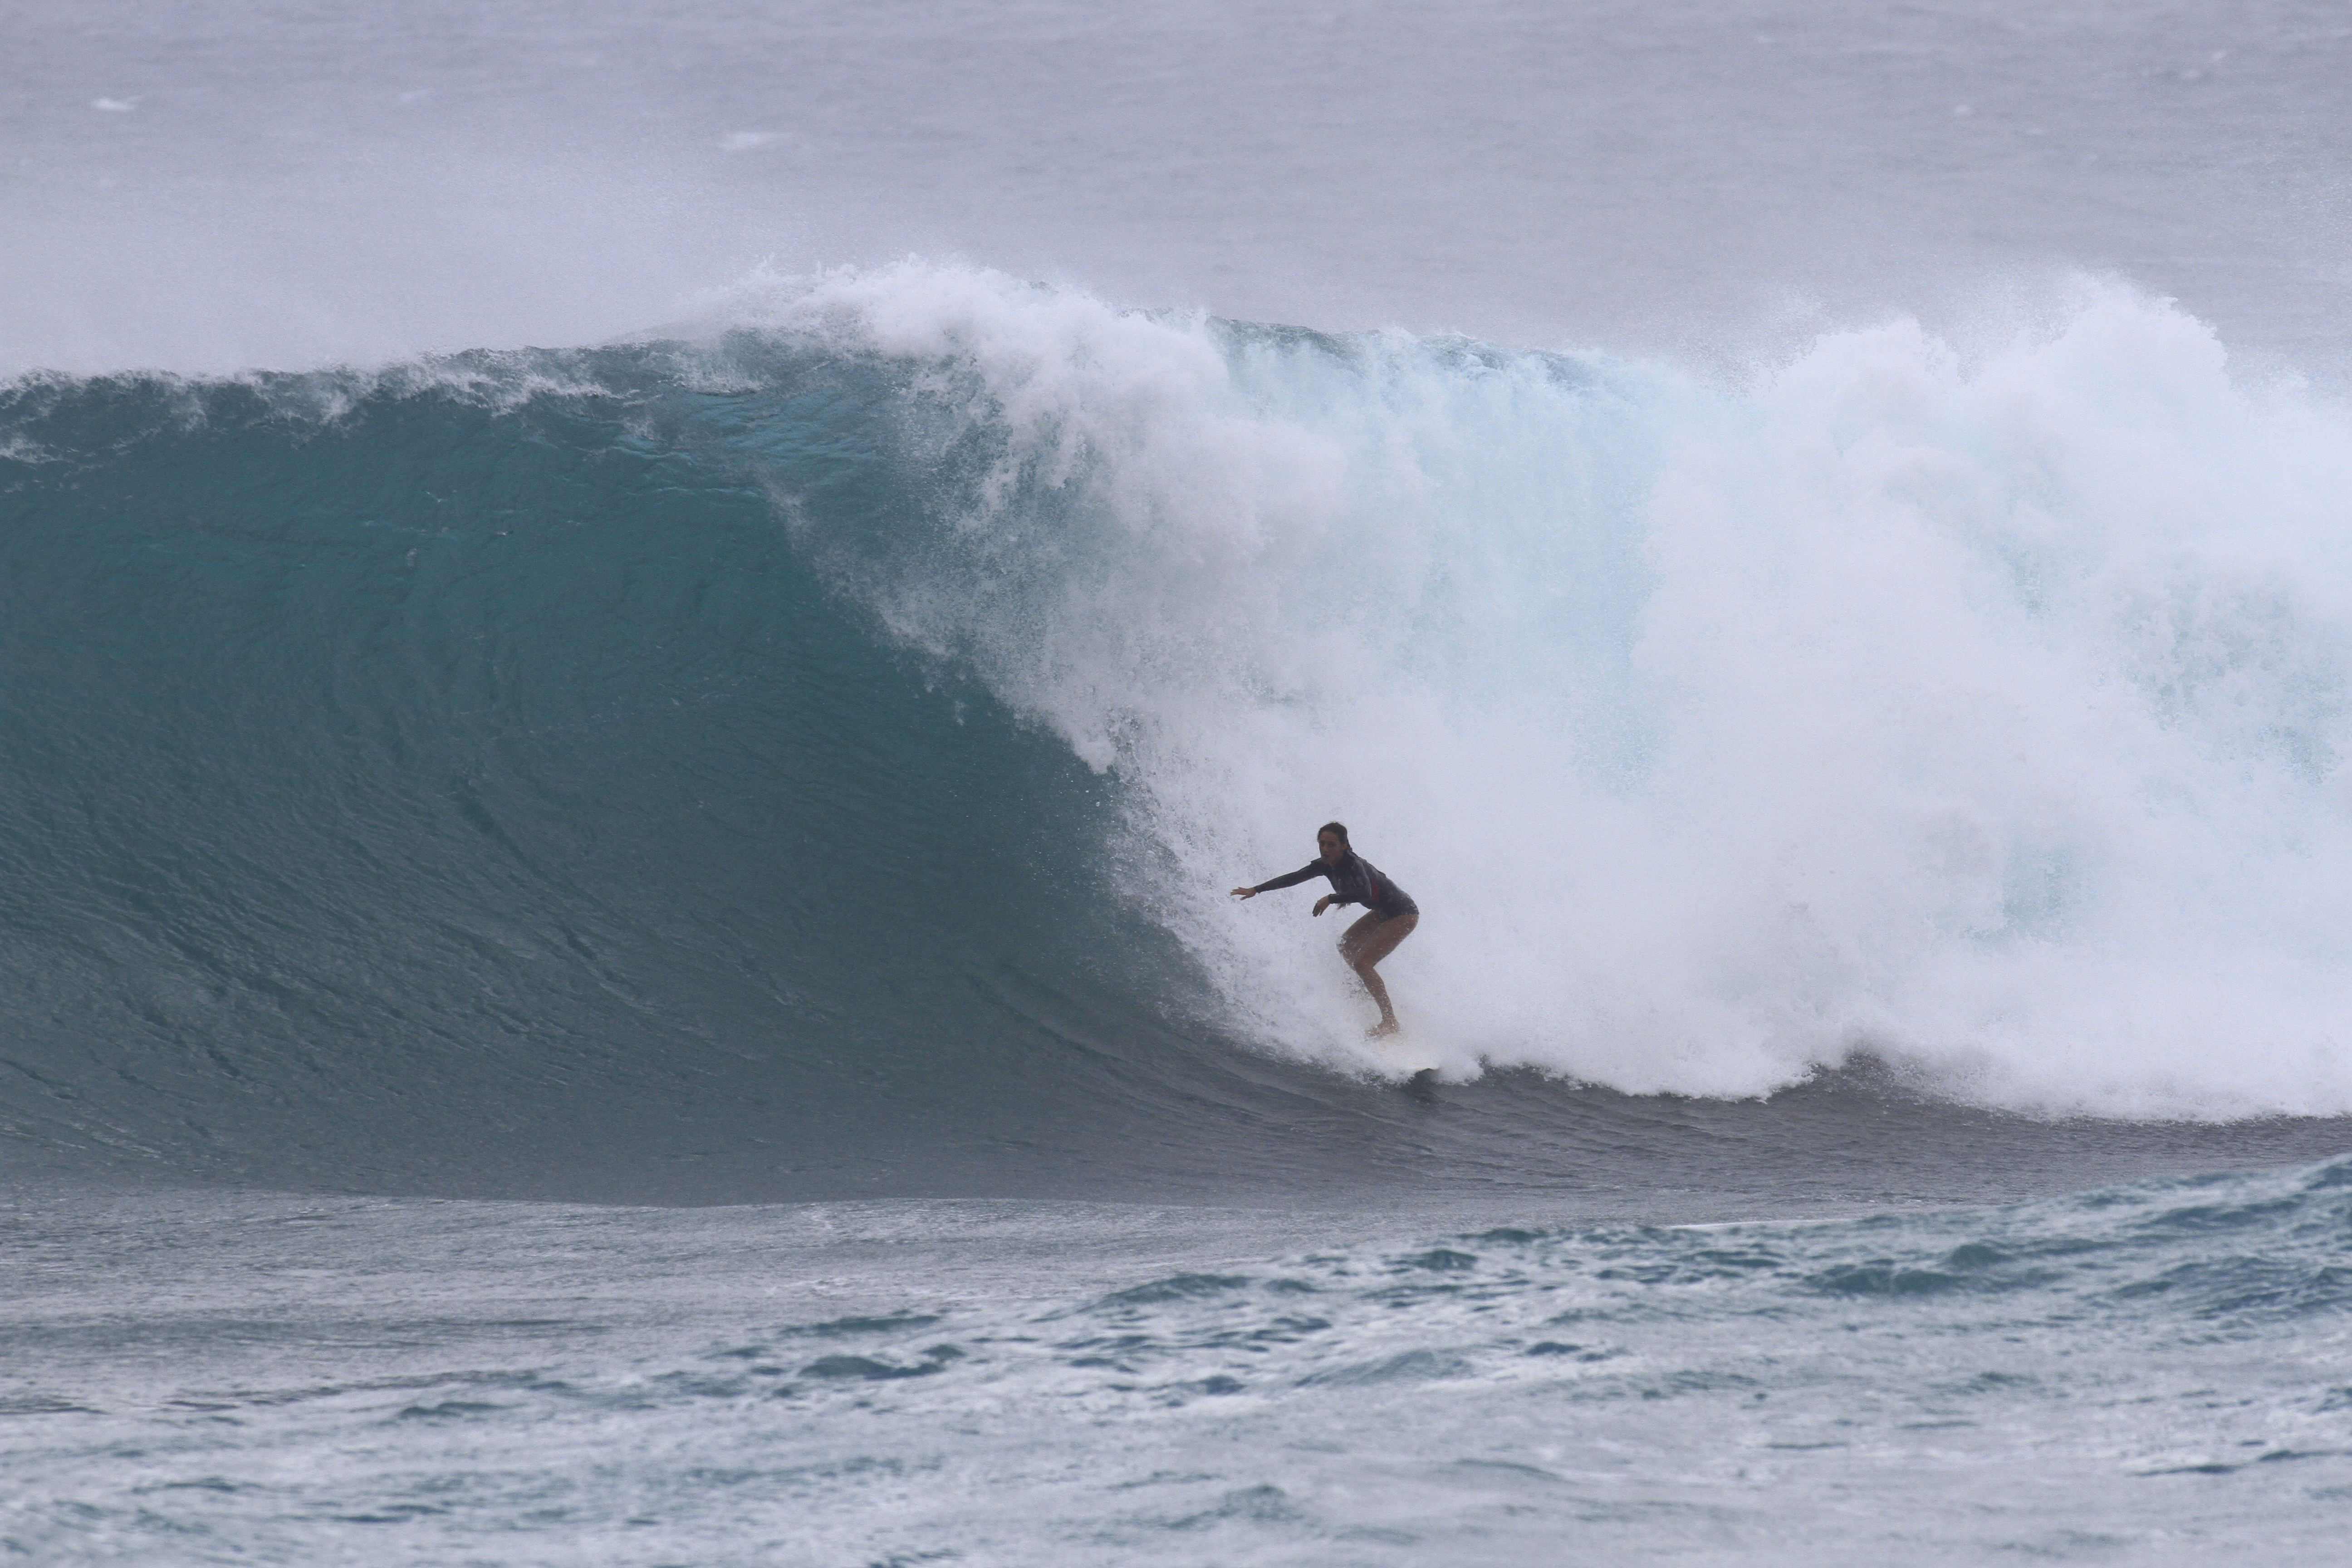 Kelta Kauai